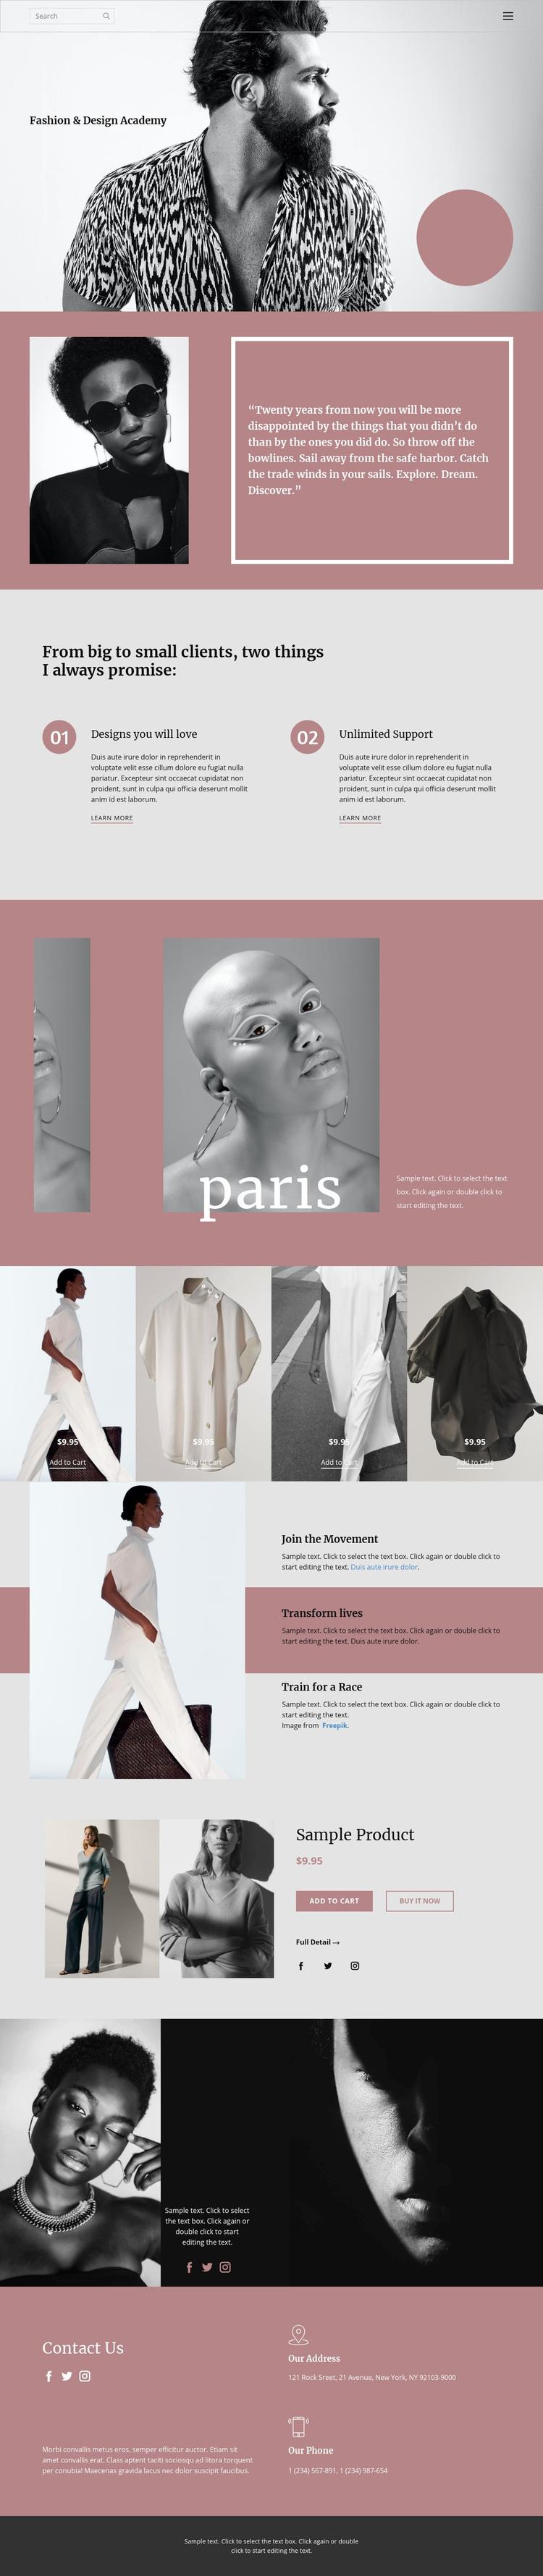 Fashion studio Web Page Designer